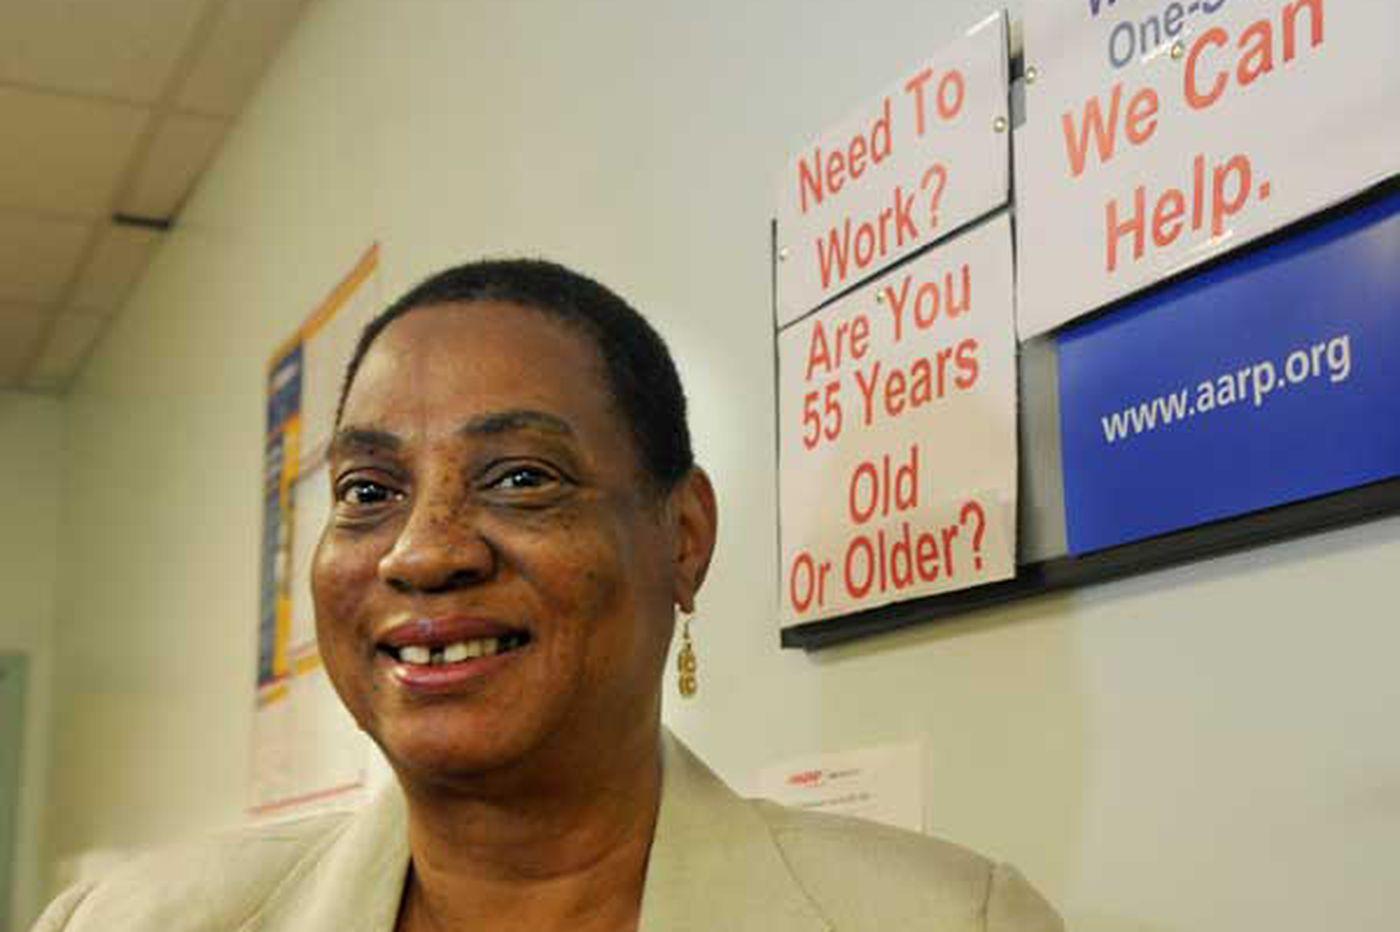 Boomers' financial outlook darkens as retirement nears